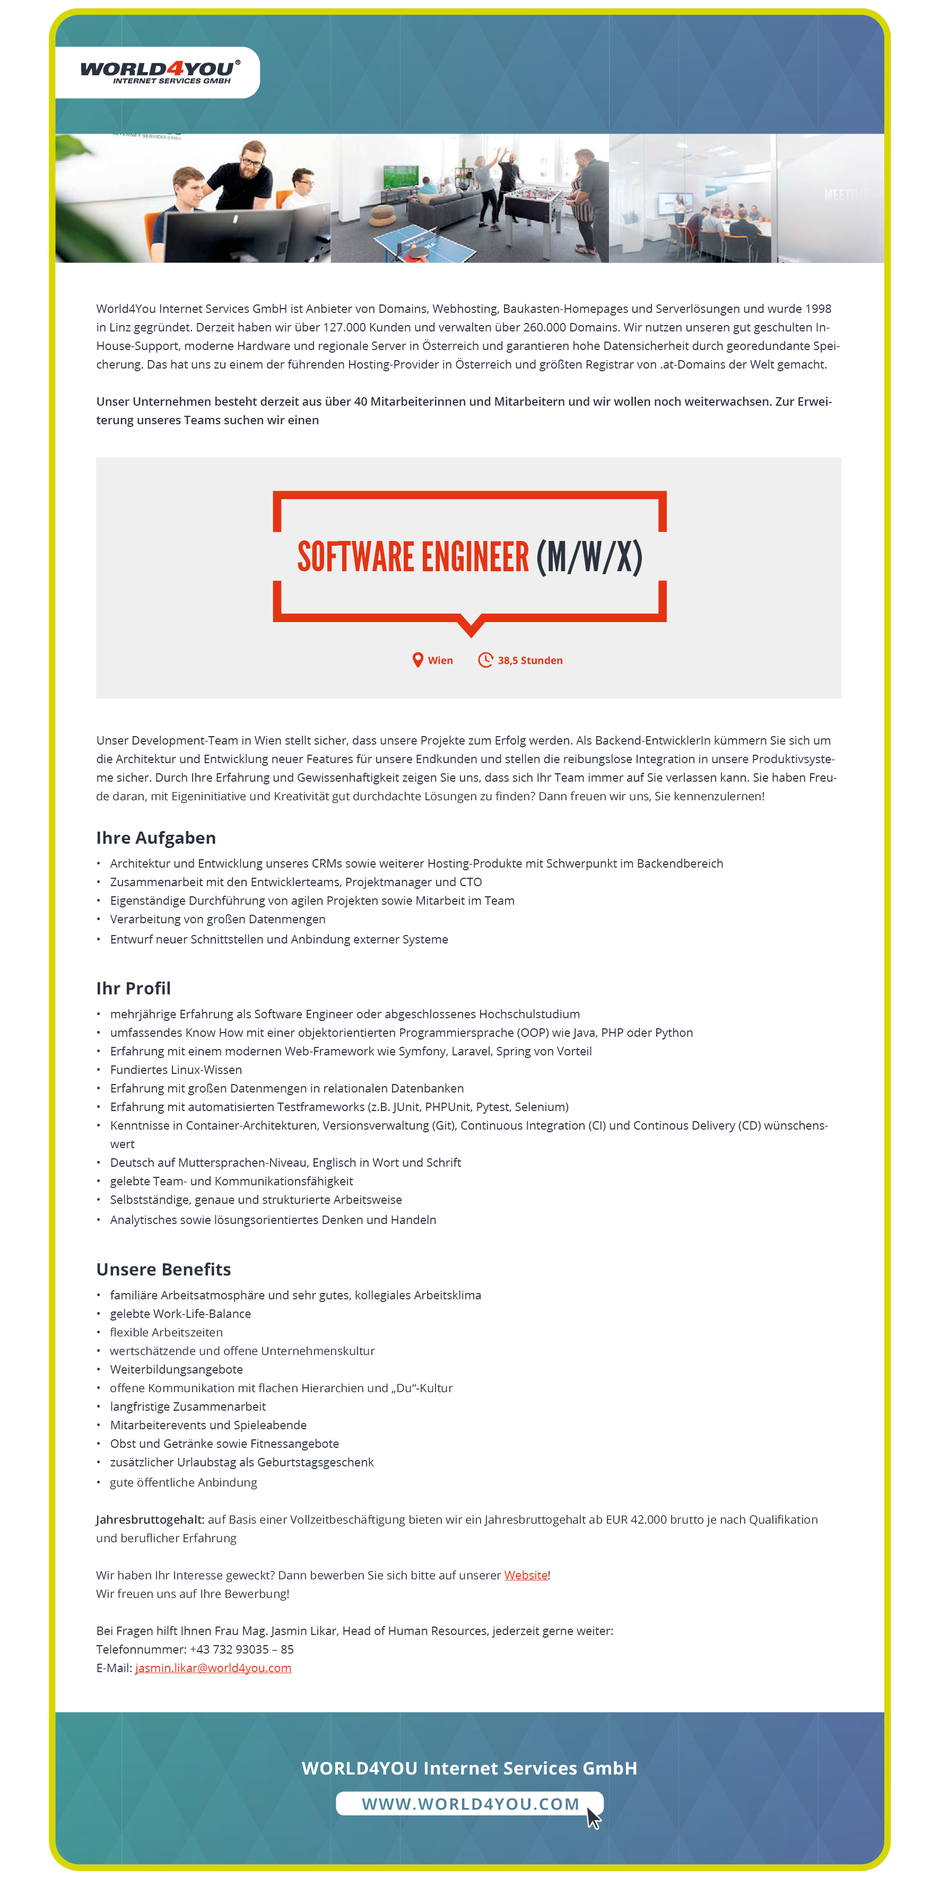 Software Developer Jobs - Software Engineer - World4You Internet Services GmbH - Wien - 1